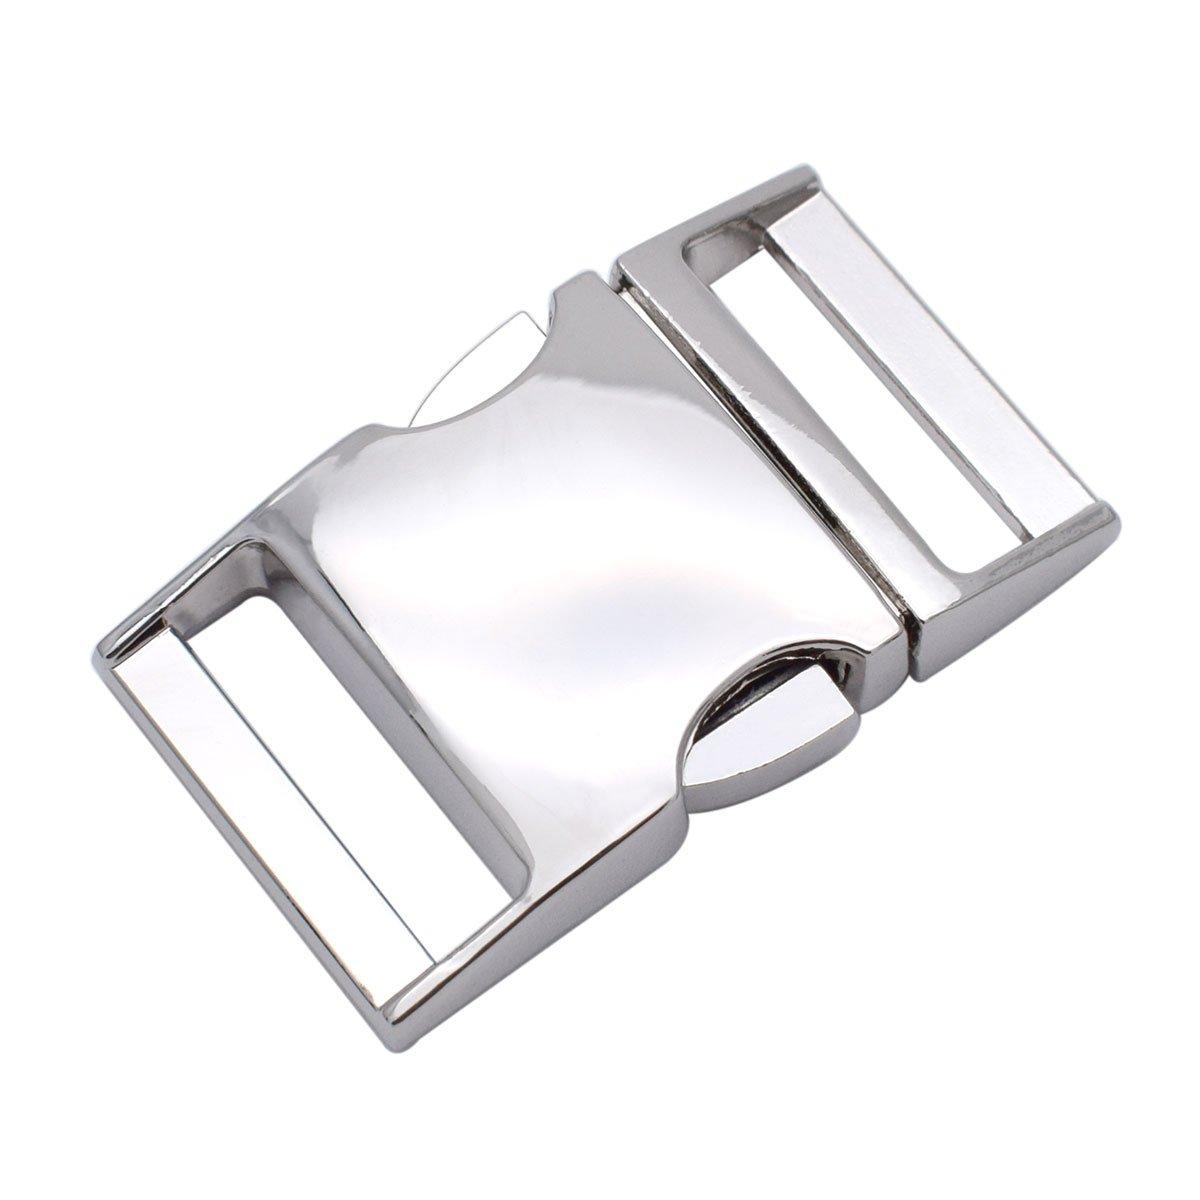 1 Inch Metal Buckles Side Release Clasp Use for 25mm Webbing/Paracord Bracelet/Bag/Backpack 5 Pack